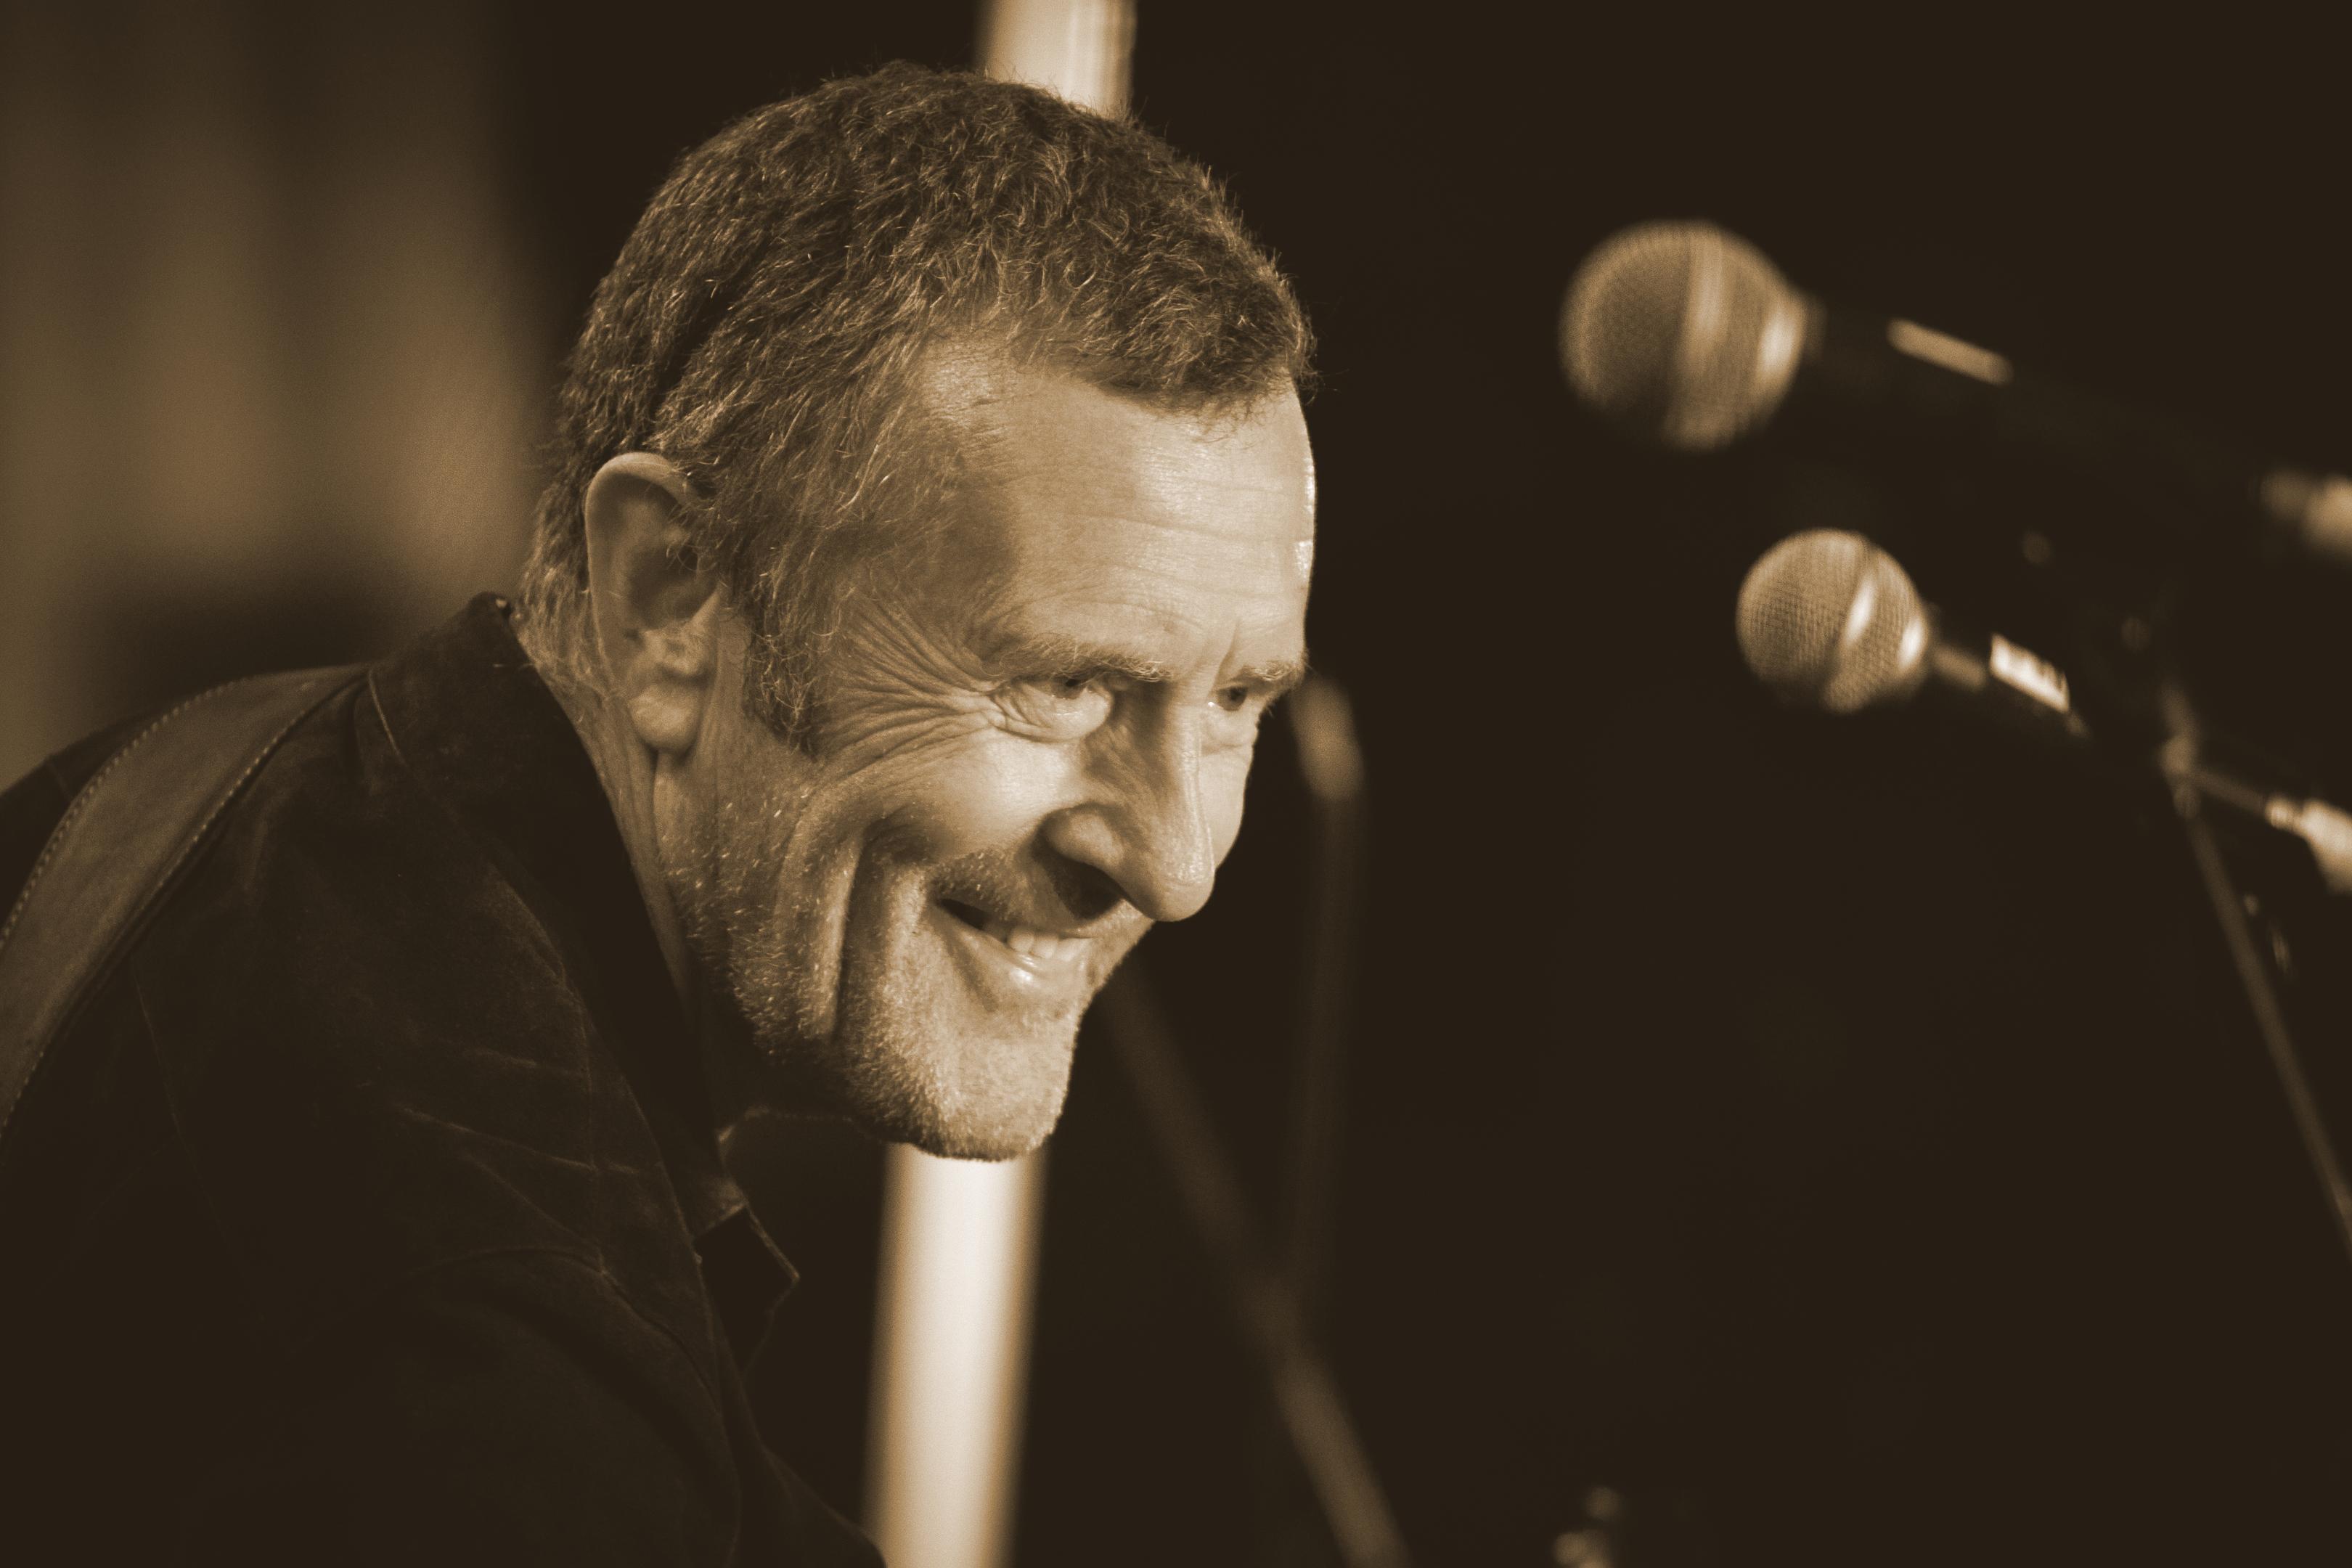 Hamish Stuart is headlining at the 2020 Aberdeen Jazz Festival.